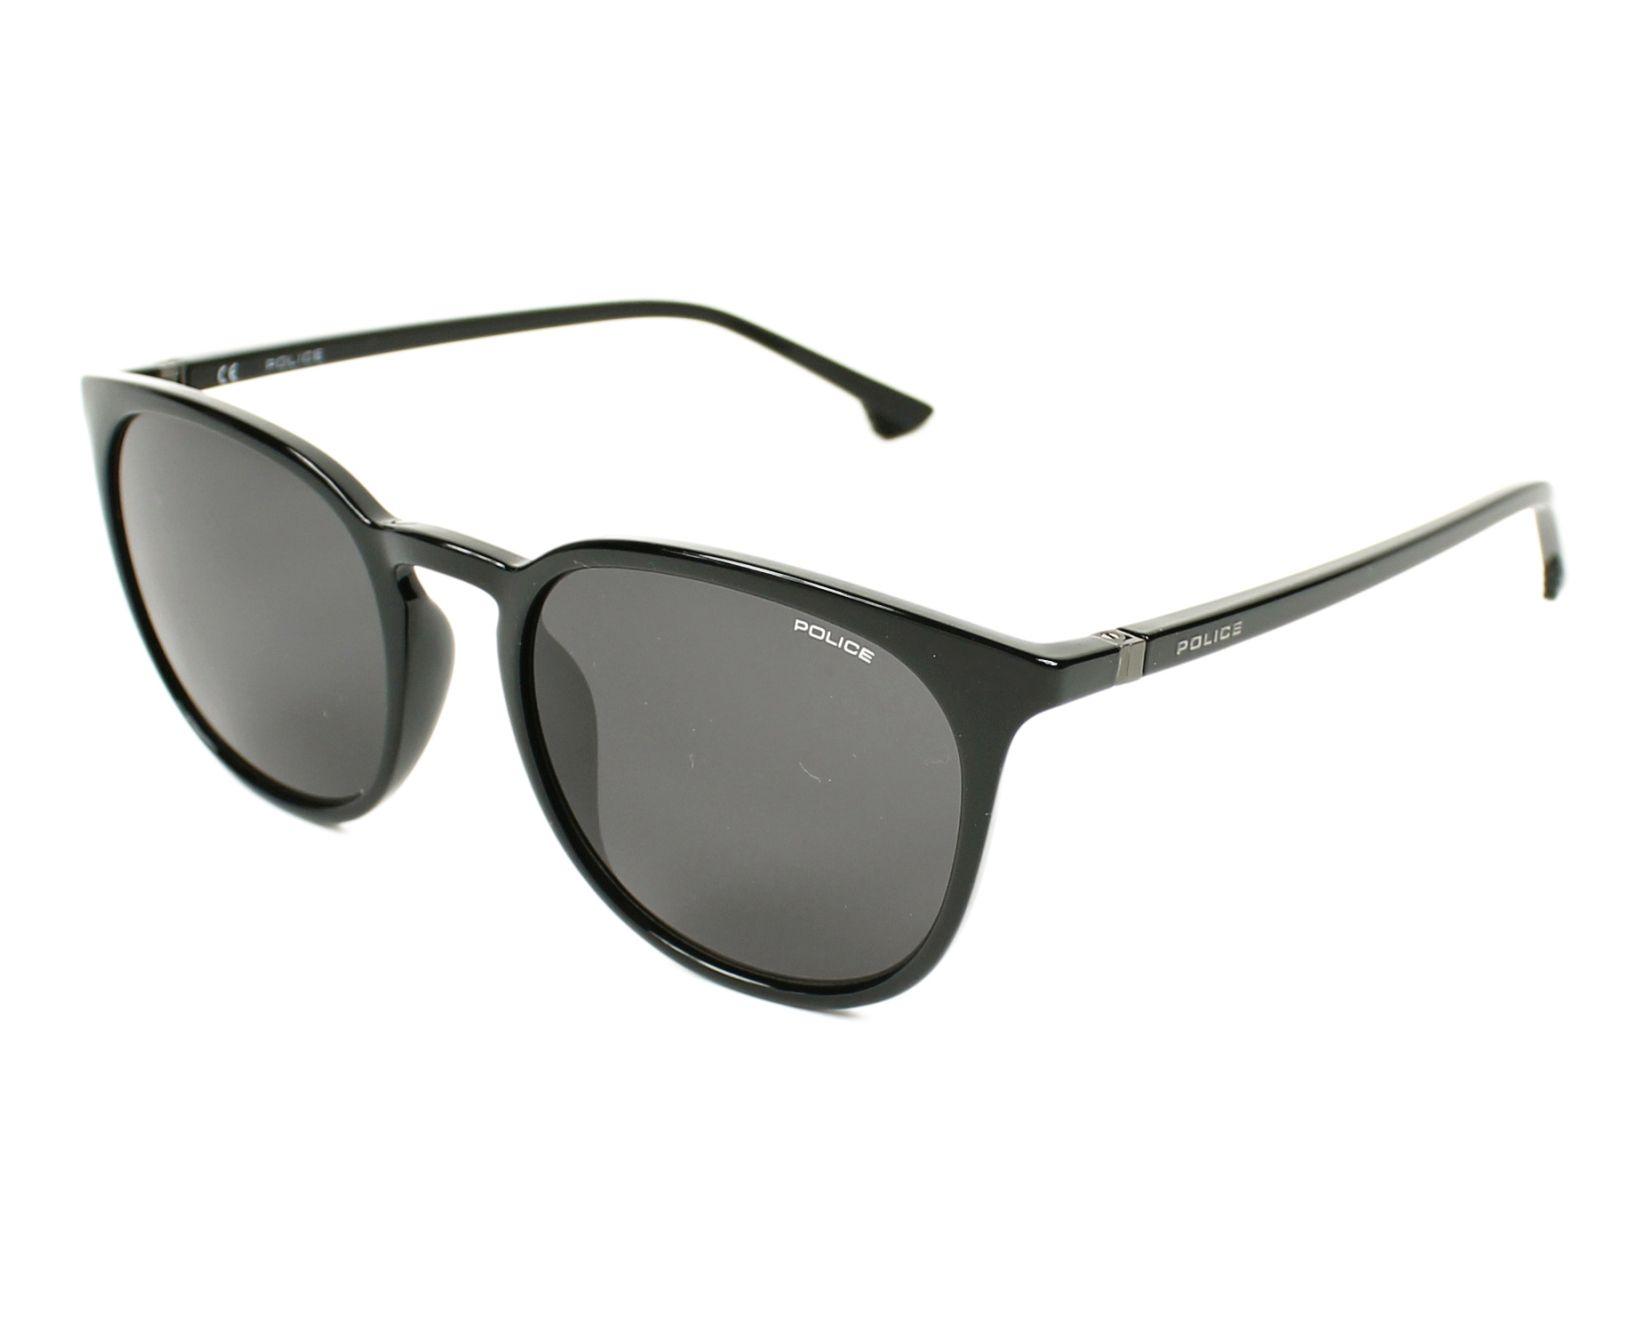 thumbnail Sunglasses Police SPL-343 0Z42 - Black profile view ab7bb67f04